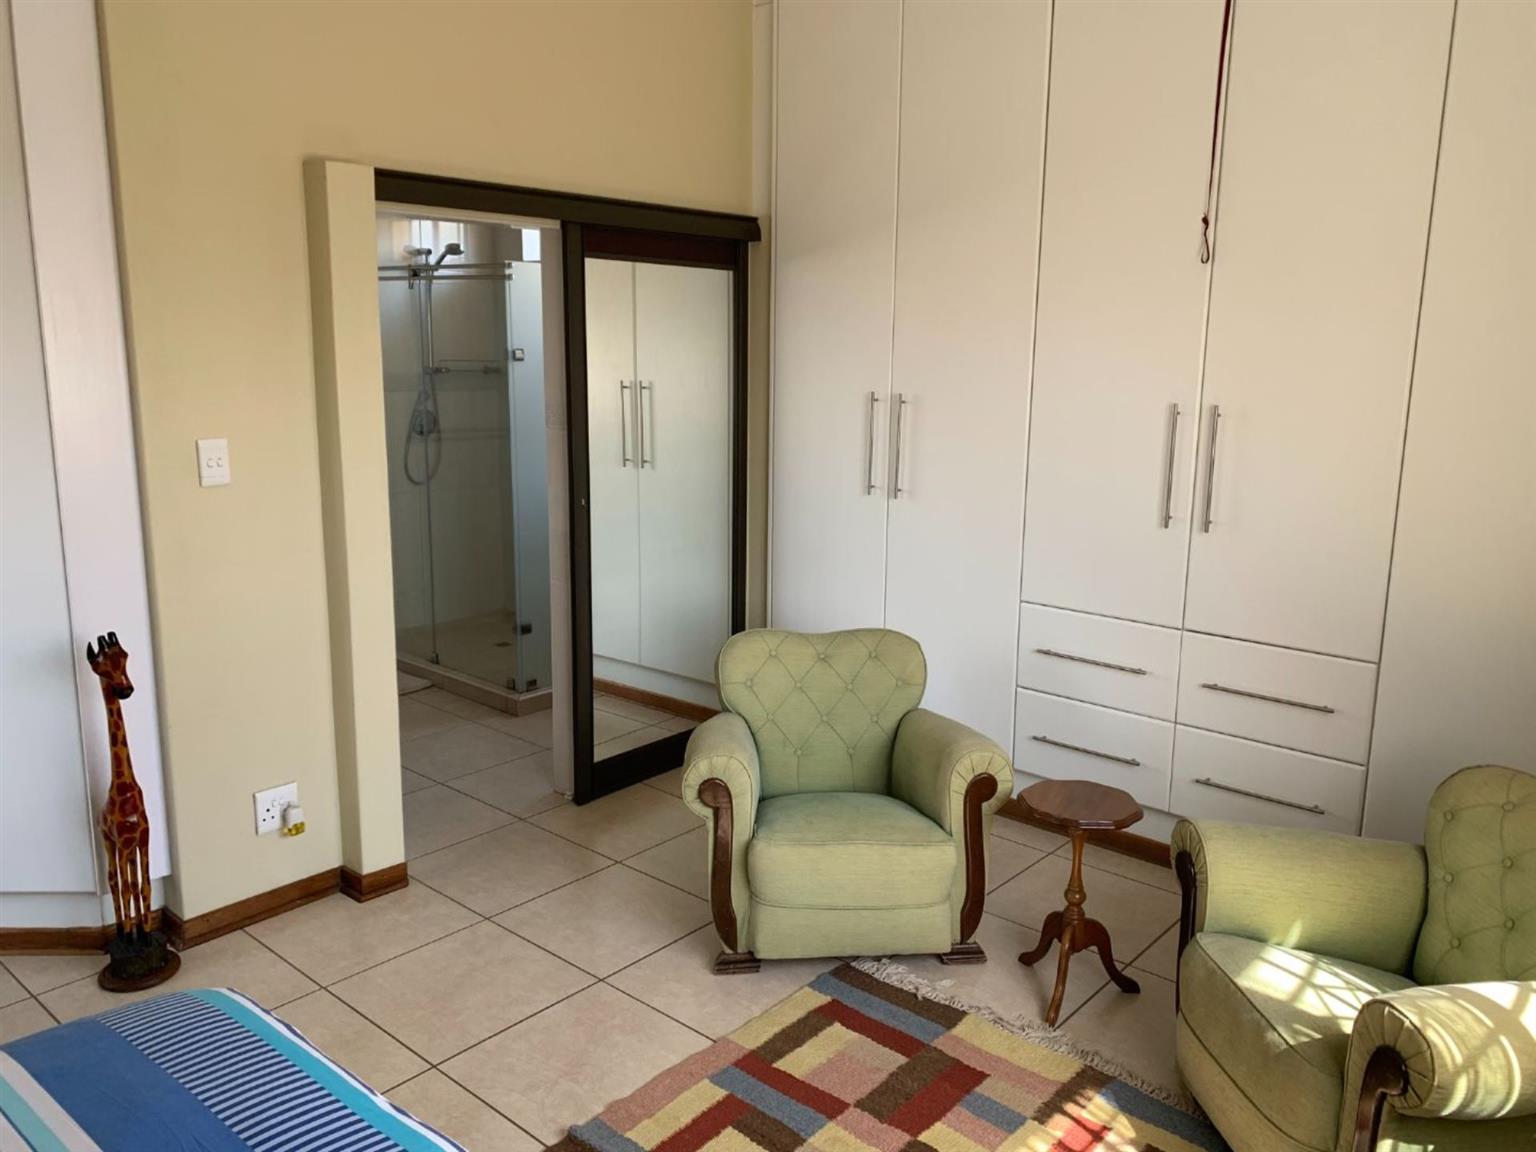 Apartment Rental Monthly in BEDFORDVIEW